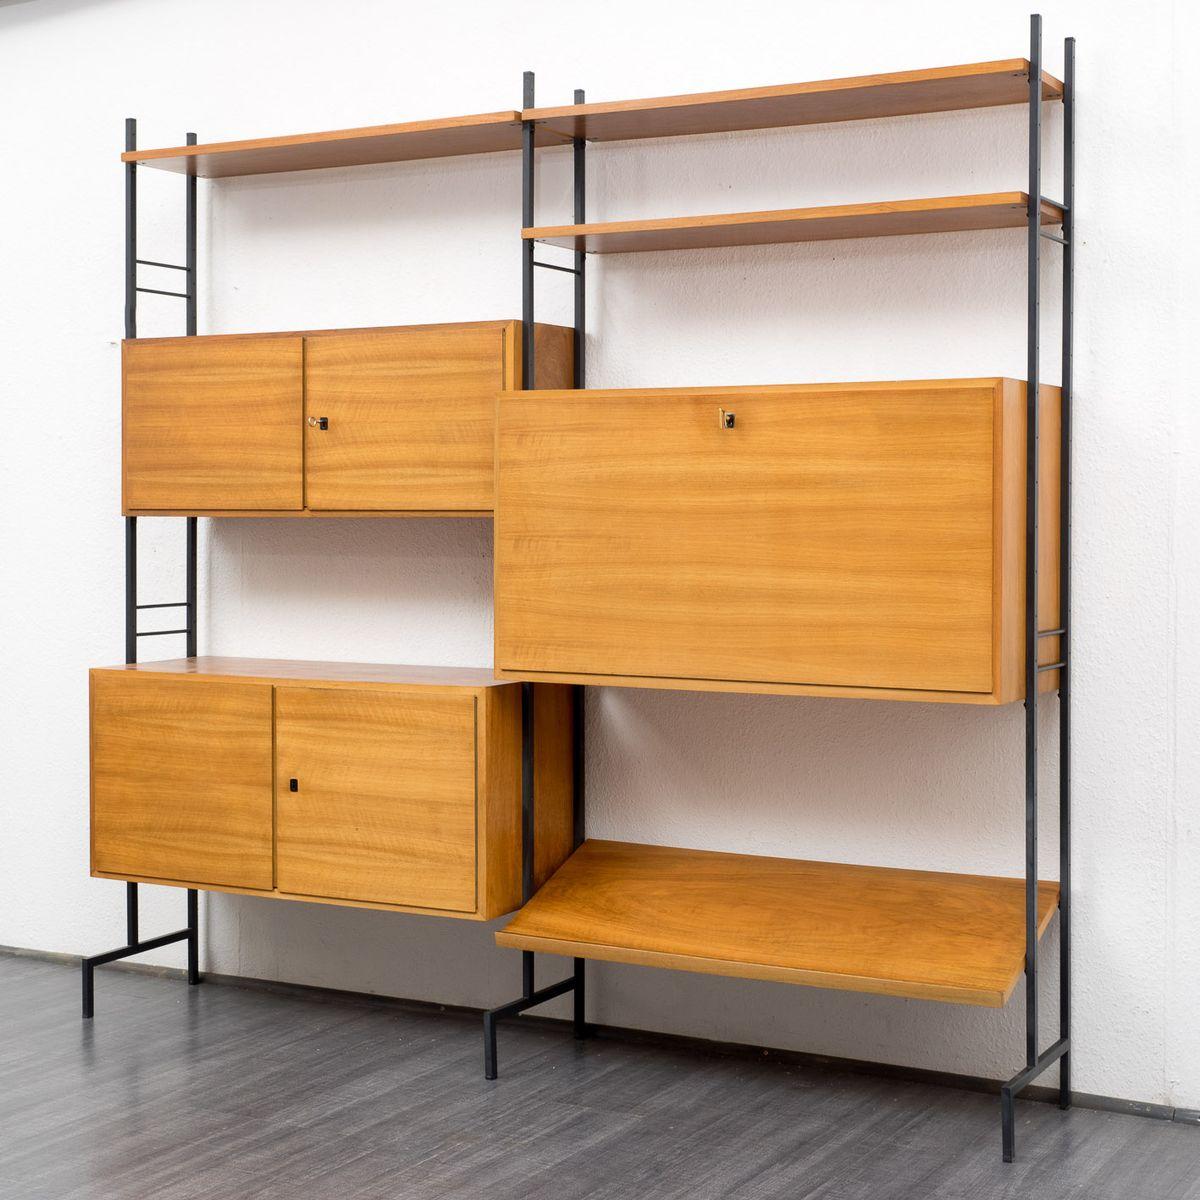 wandregalsystem mit sekret r bei pamono kaufen. Black Bedroom Furniture Sets. Home Design Ideas